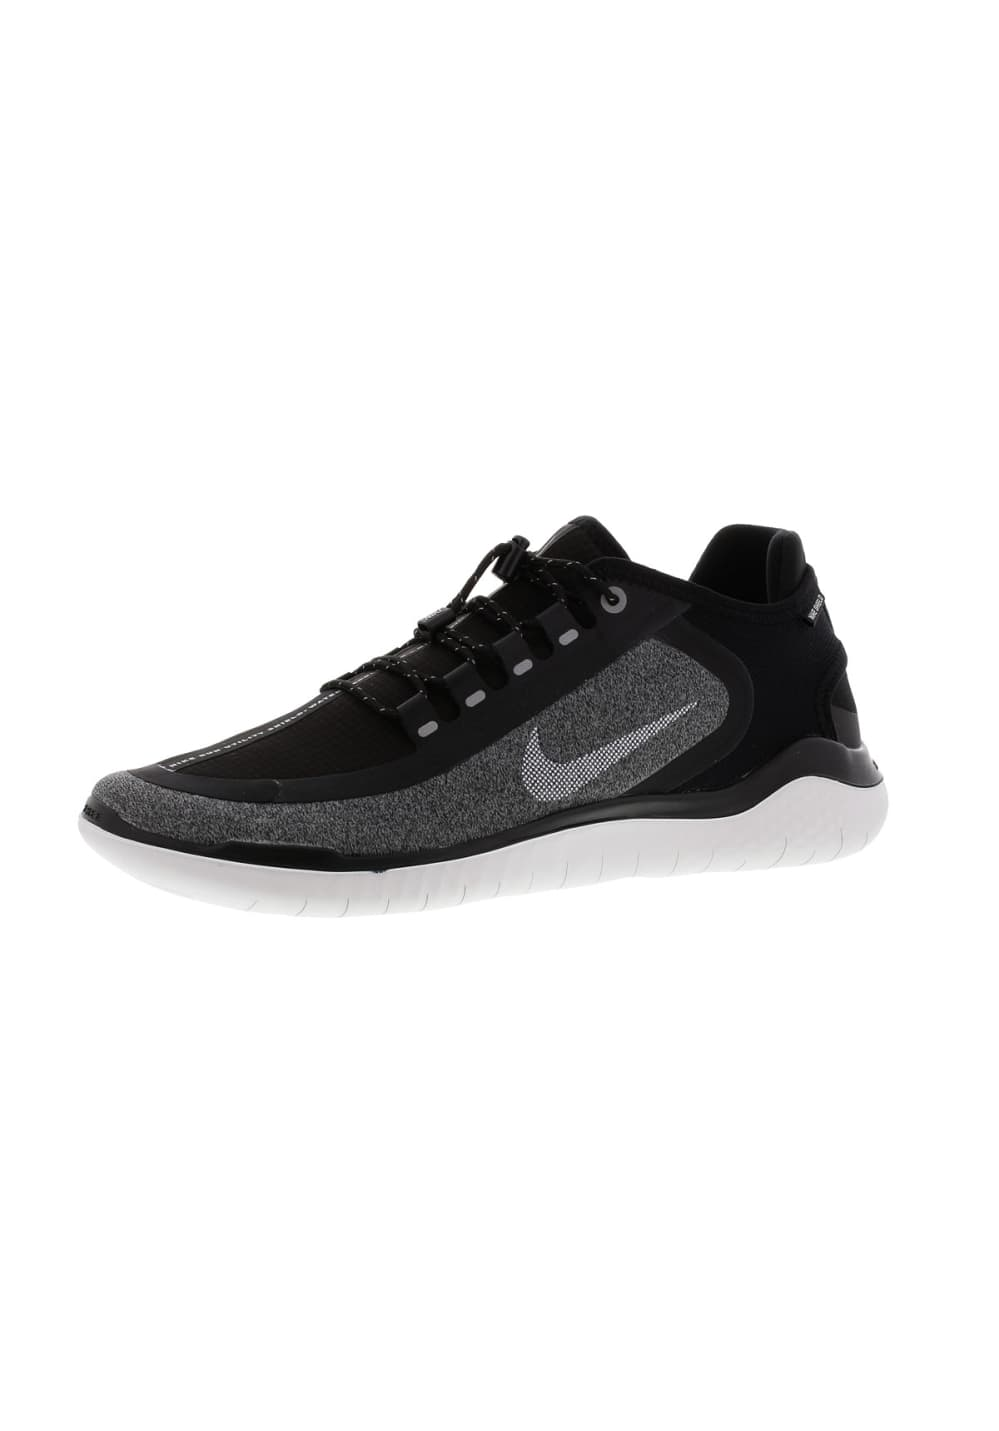 Nike Free Rn 2018 Shield - Laufschuhe für Herren - Grau